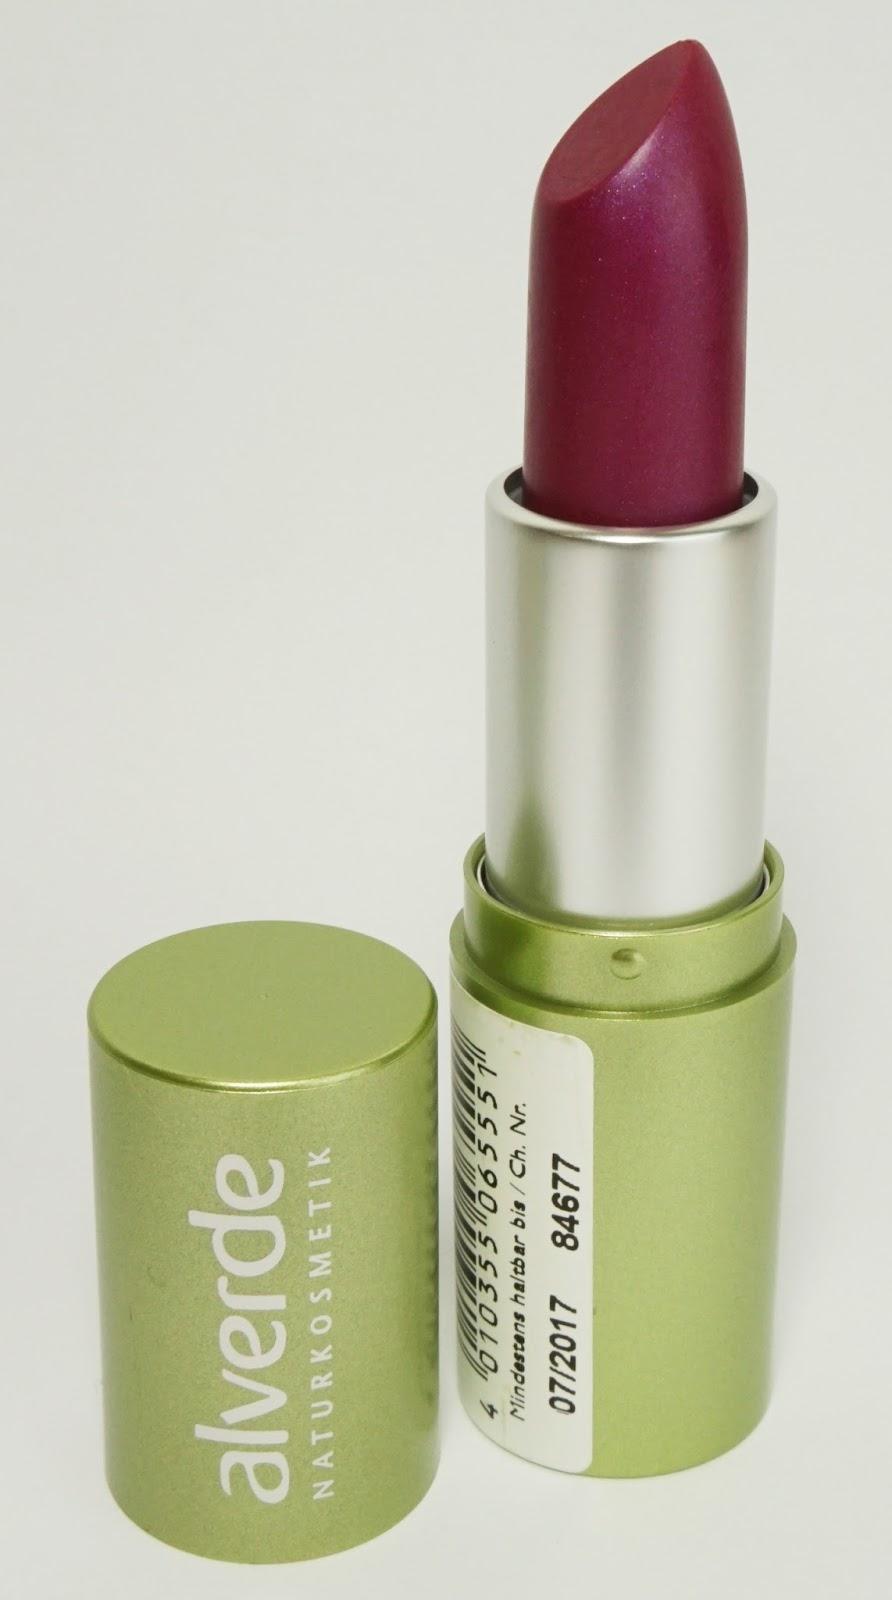 Alverde - Lippenstift 29 Fabulous Pink